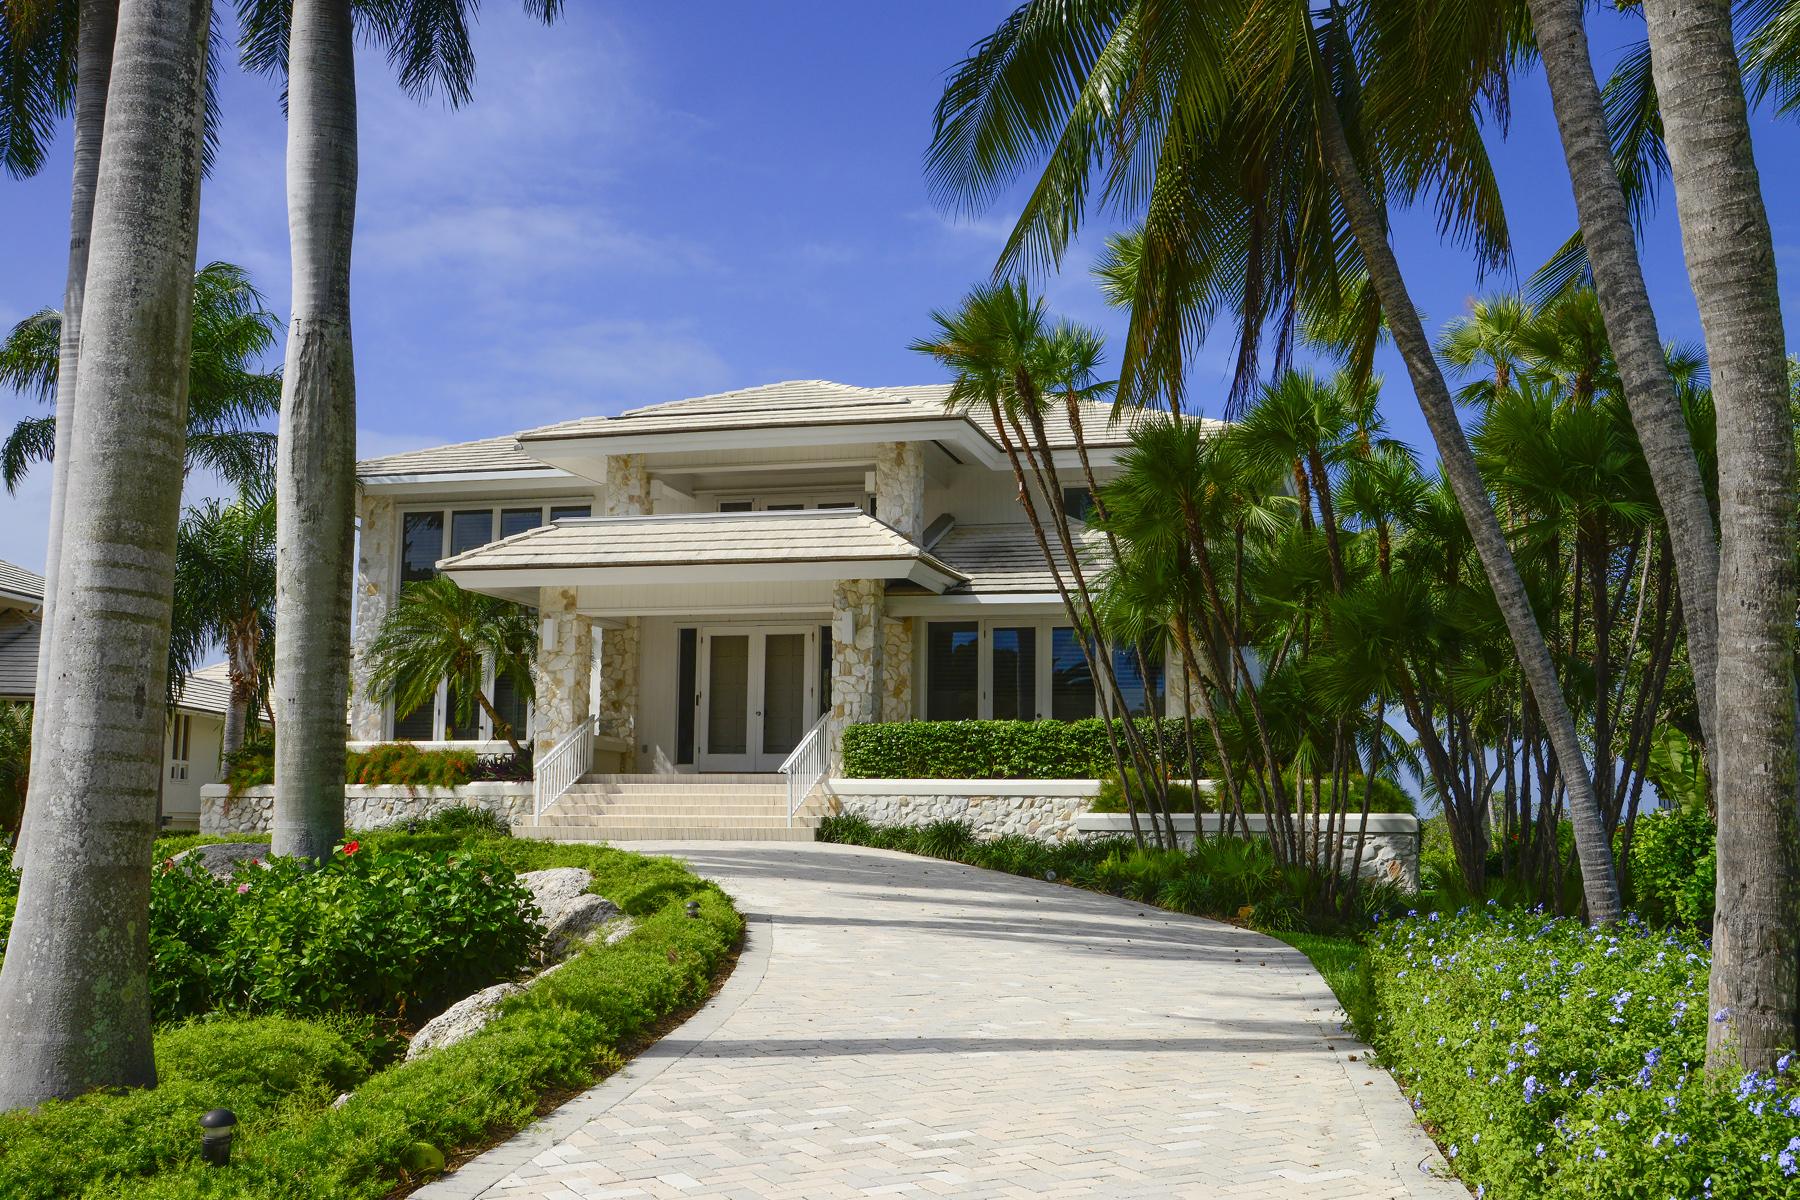 Casa para uma família para Venda às Waterfront Living at Ocean Reef 13 Osprey Lane Ocean Reef Community, Key Largo, Florida, 33037 Estados Unidos